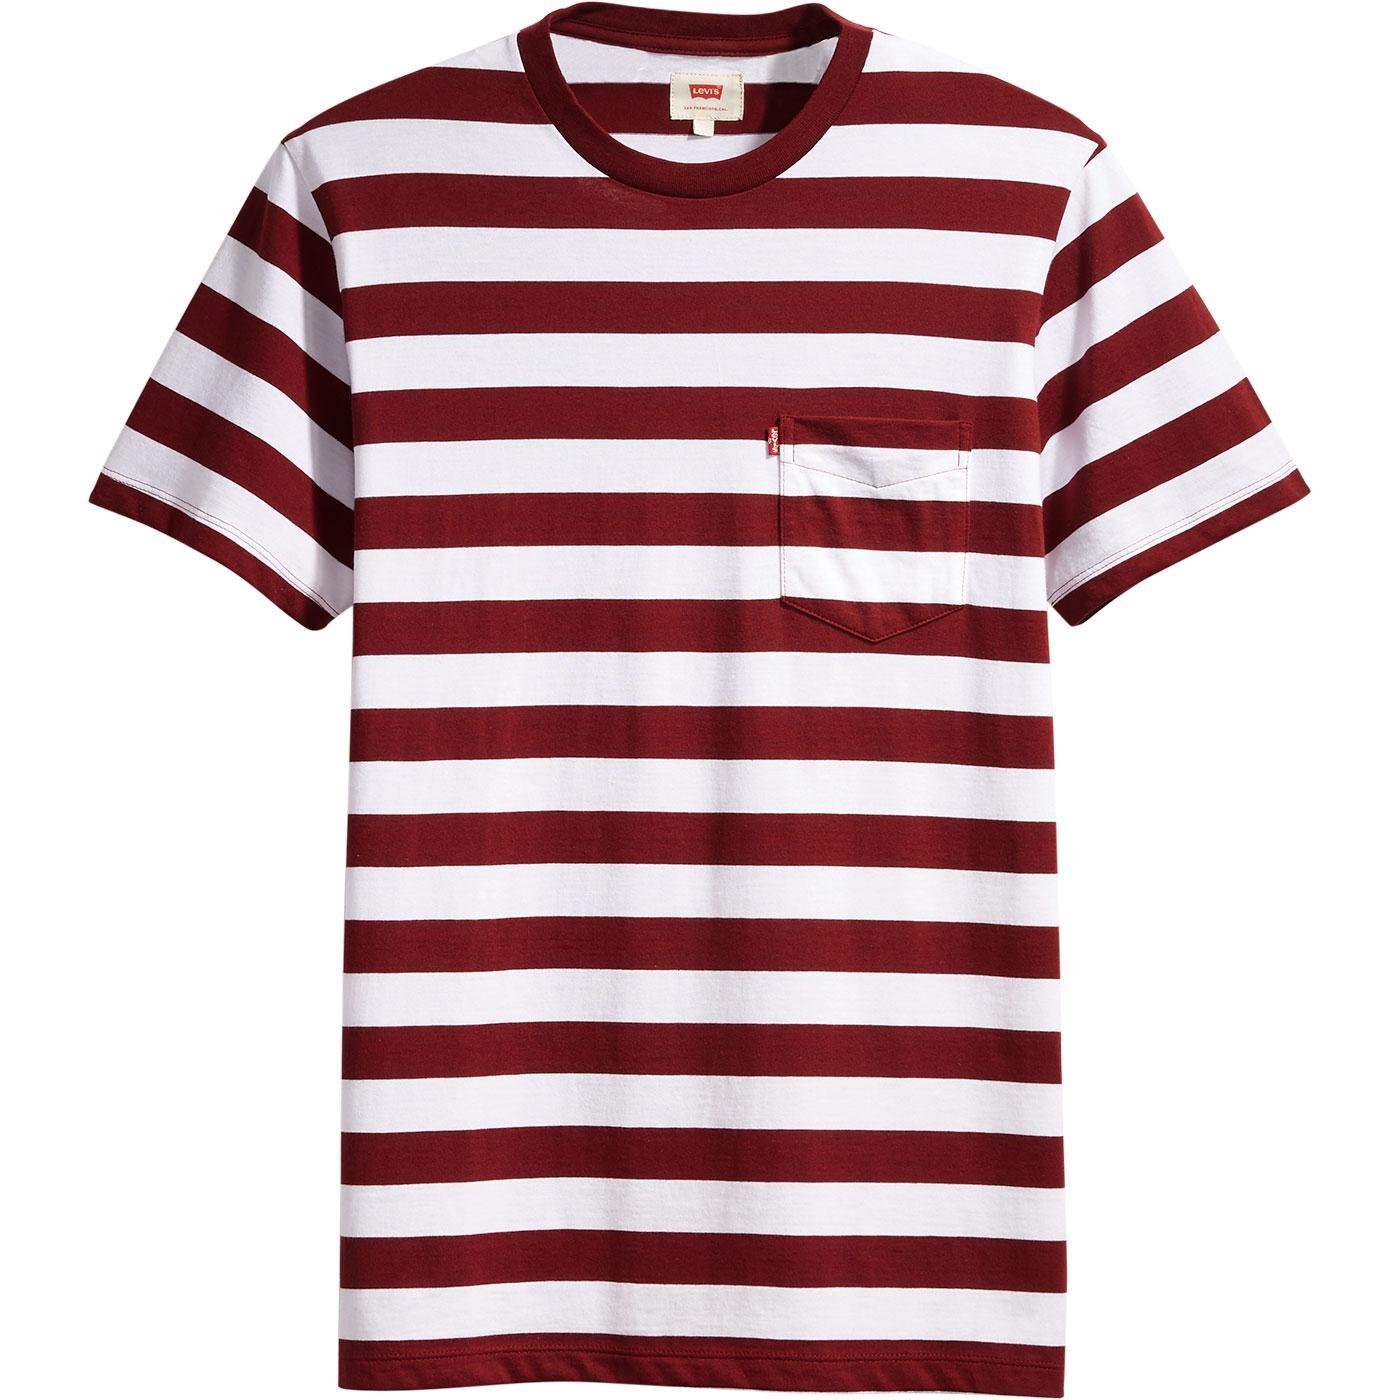 Retro Indie Striped Navy//White//Red Cotton Pocket T Shirt …